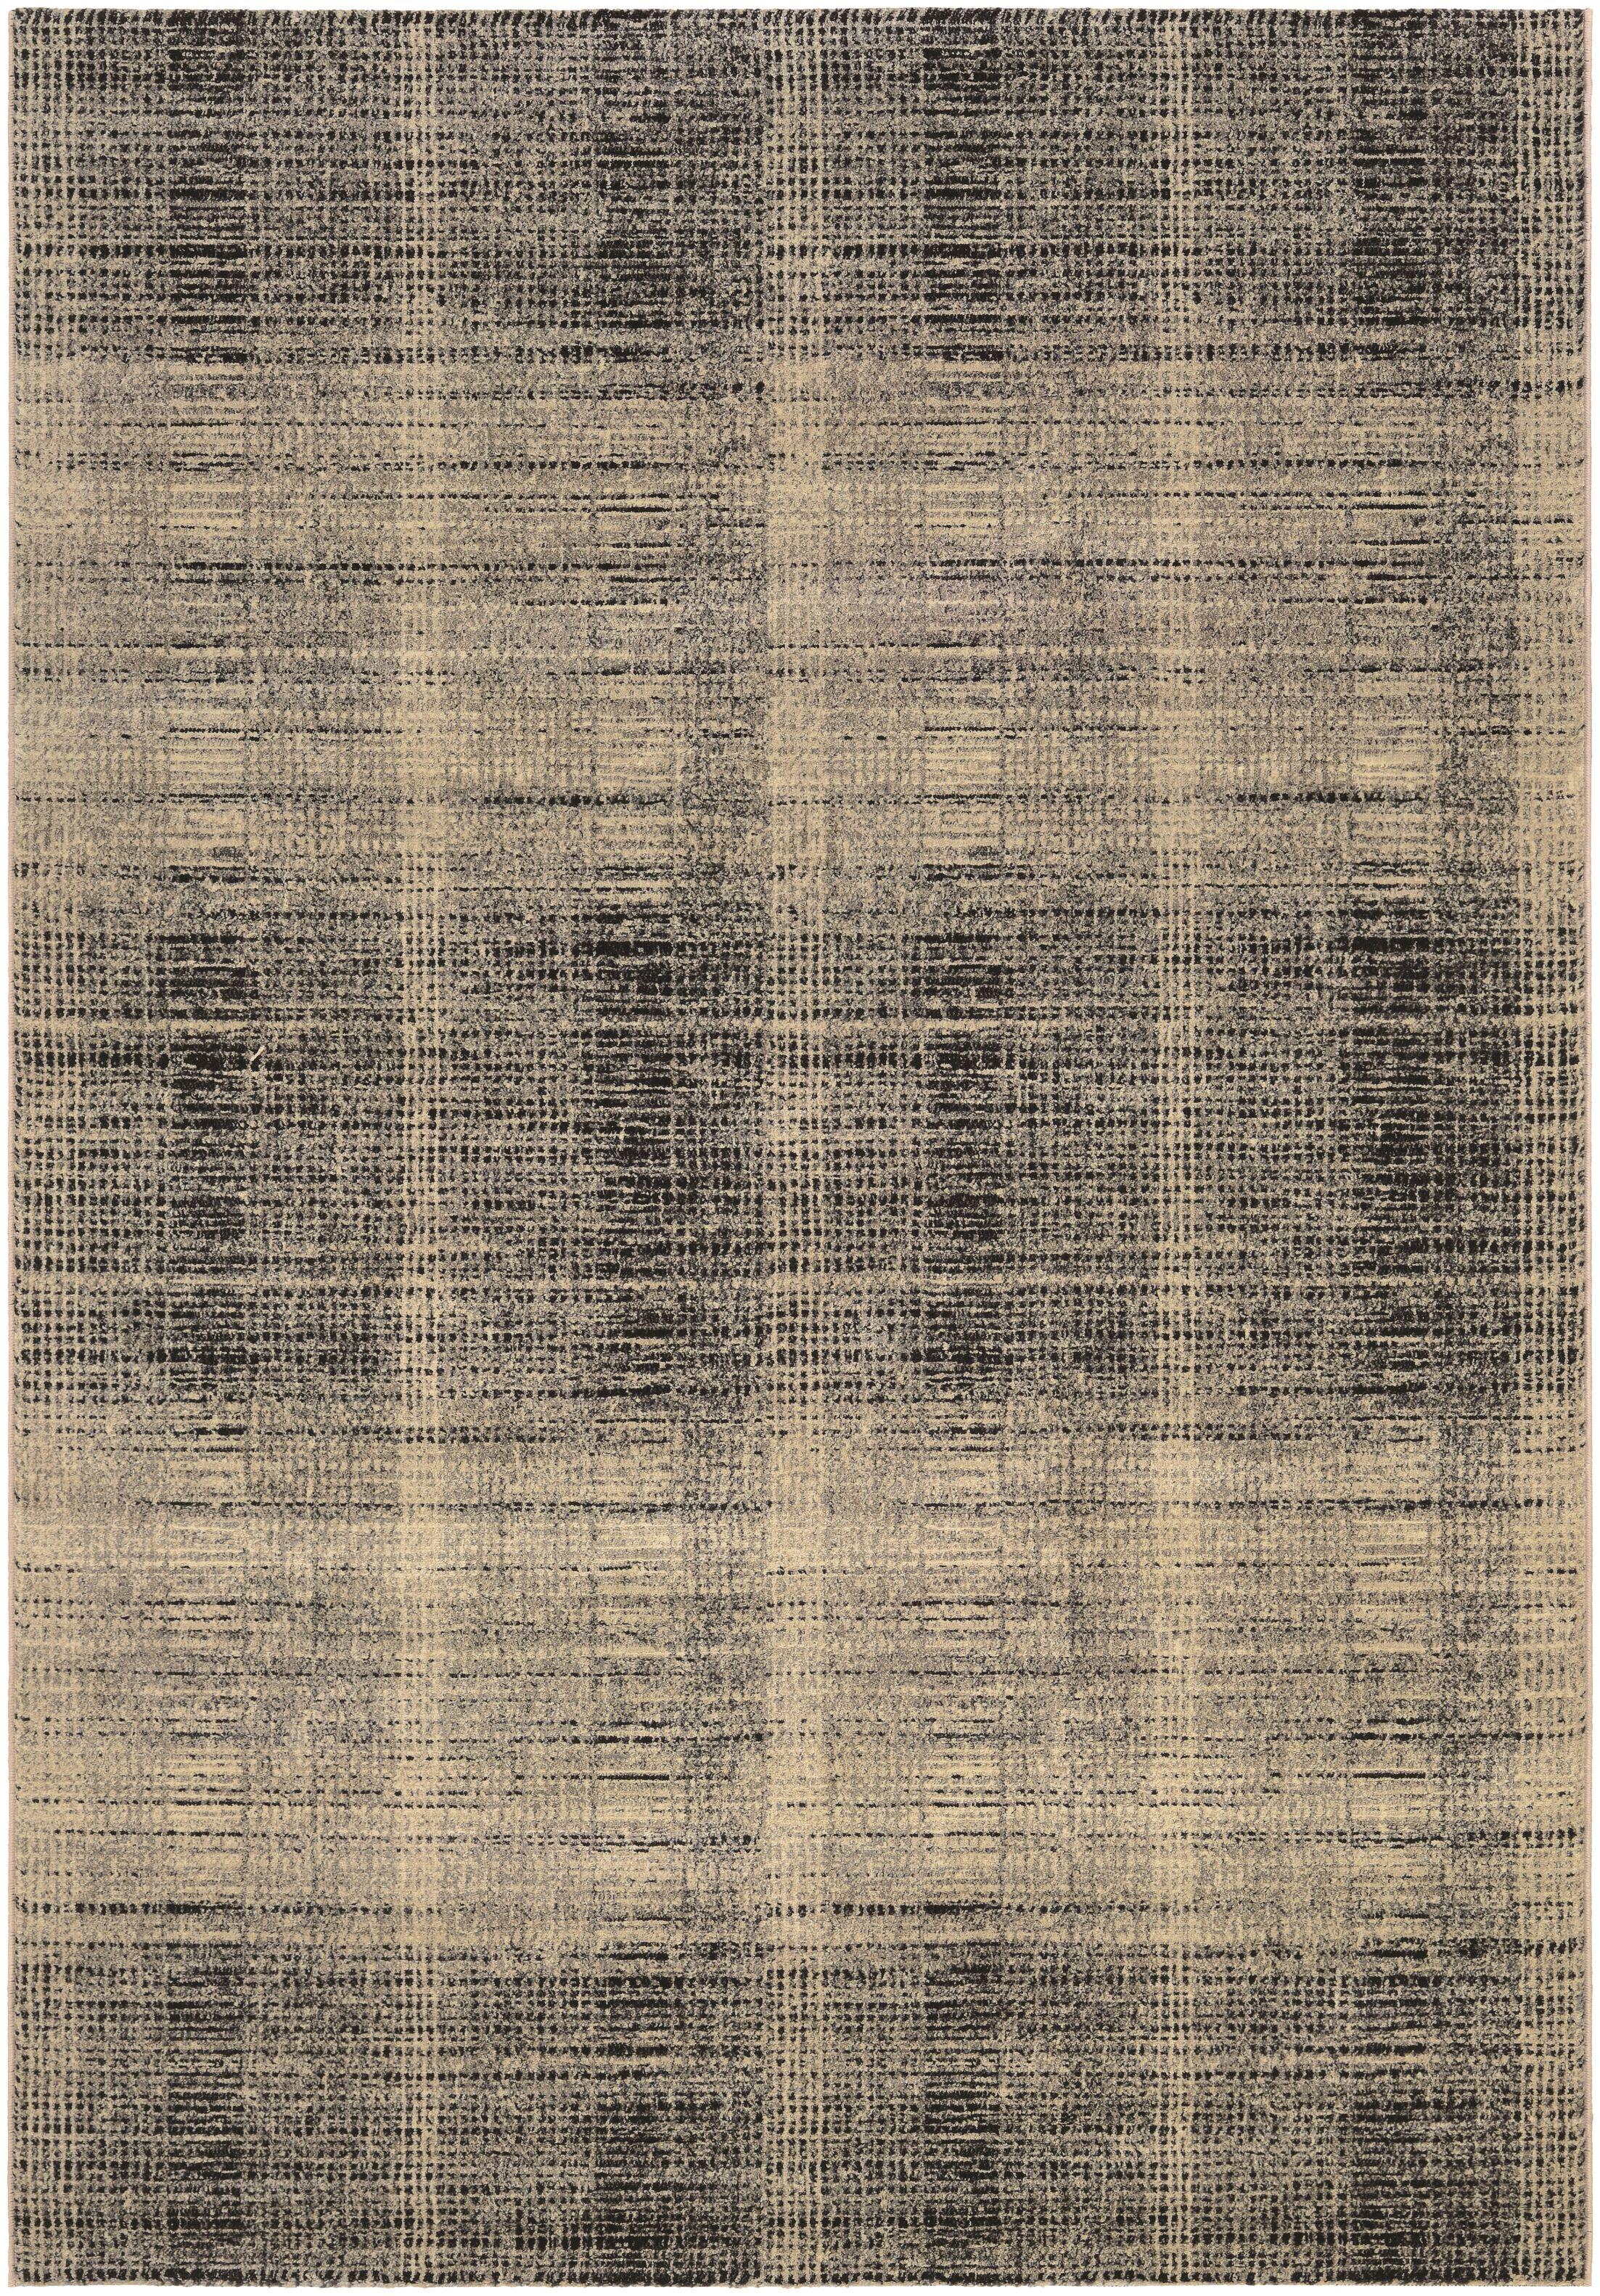 Covina Black/Gray Area Rug Rug Size: Rectangle 3'7